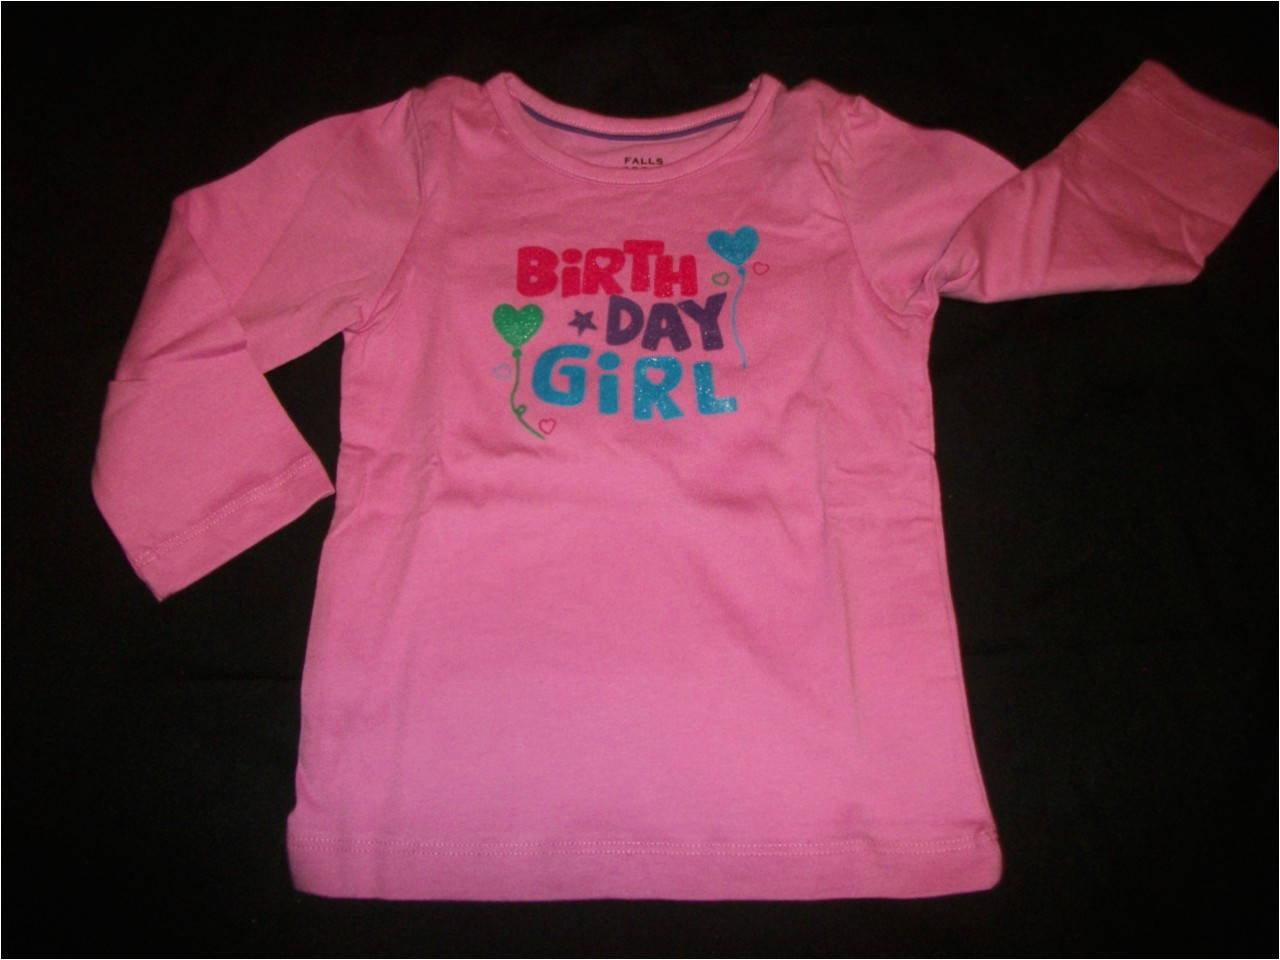 3t Birthday Girl Shirt New Girls Size 3t 4t 5t Birthday Girl Shirt Ebay